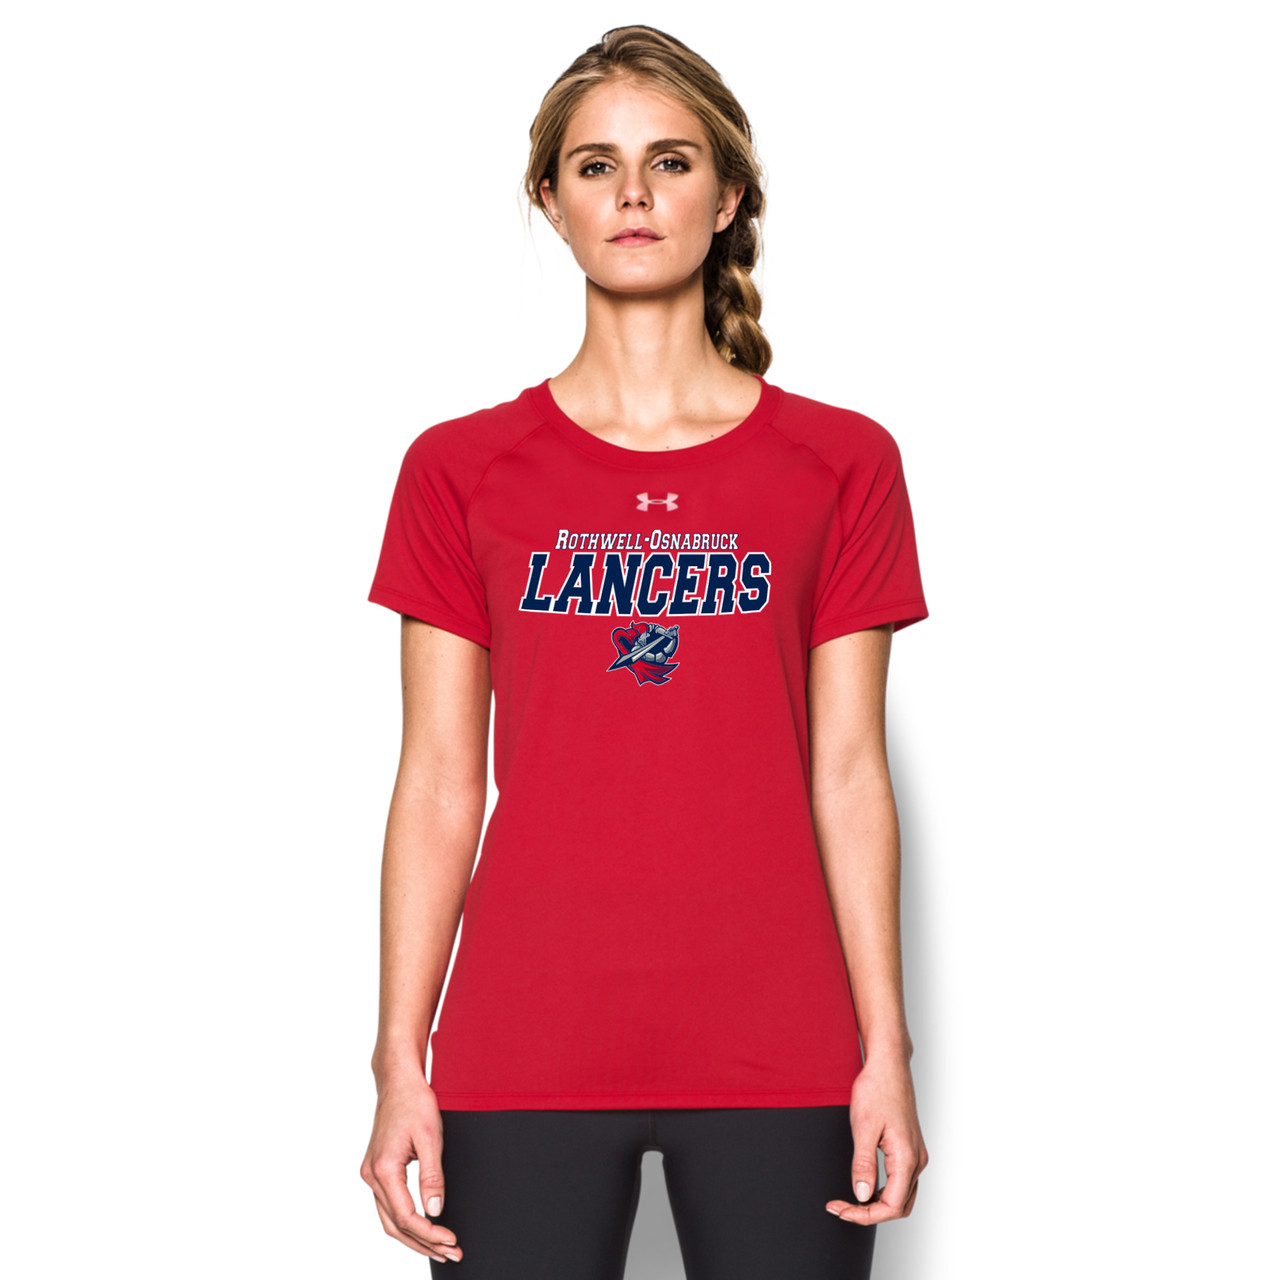 f19eb3f8d1ee ROD Under Armour Women s Short Sleeve Locker Tee - Red